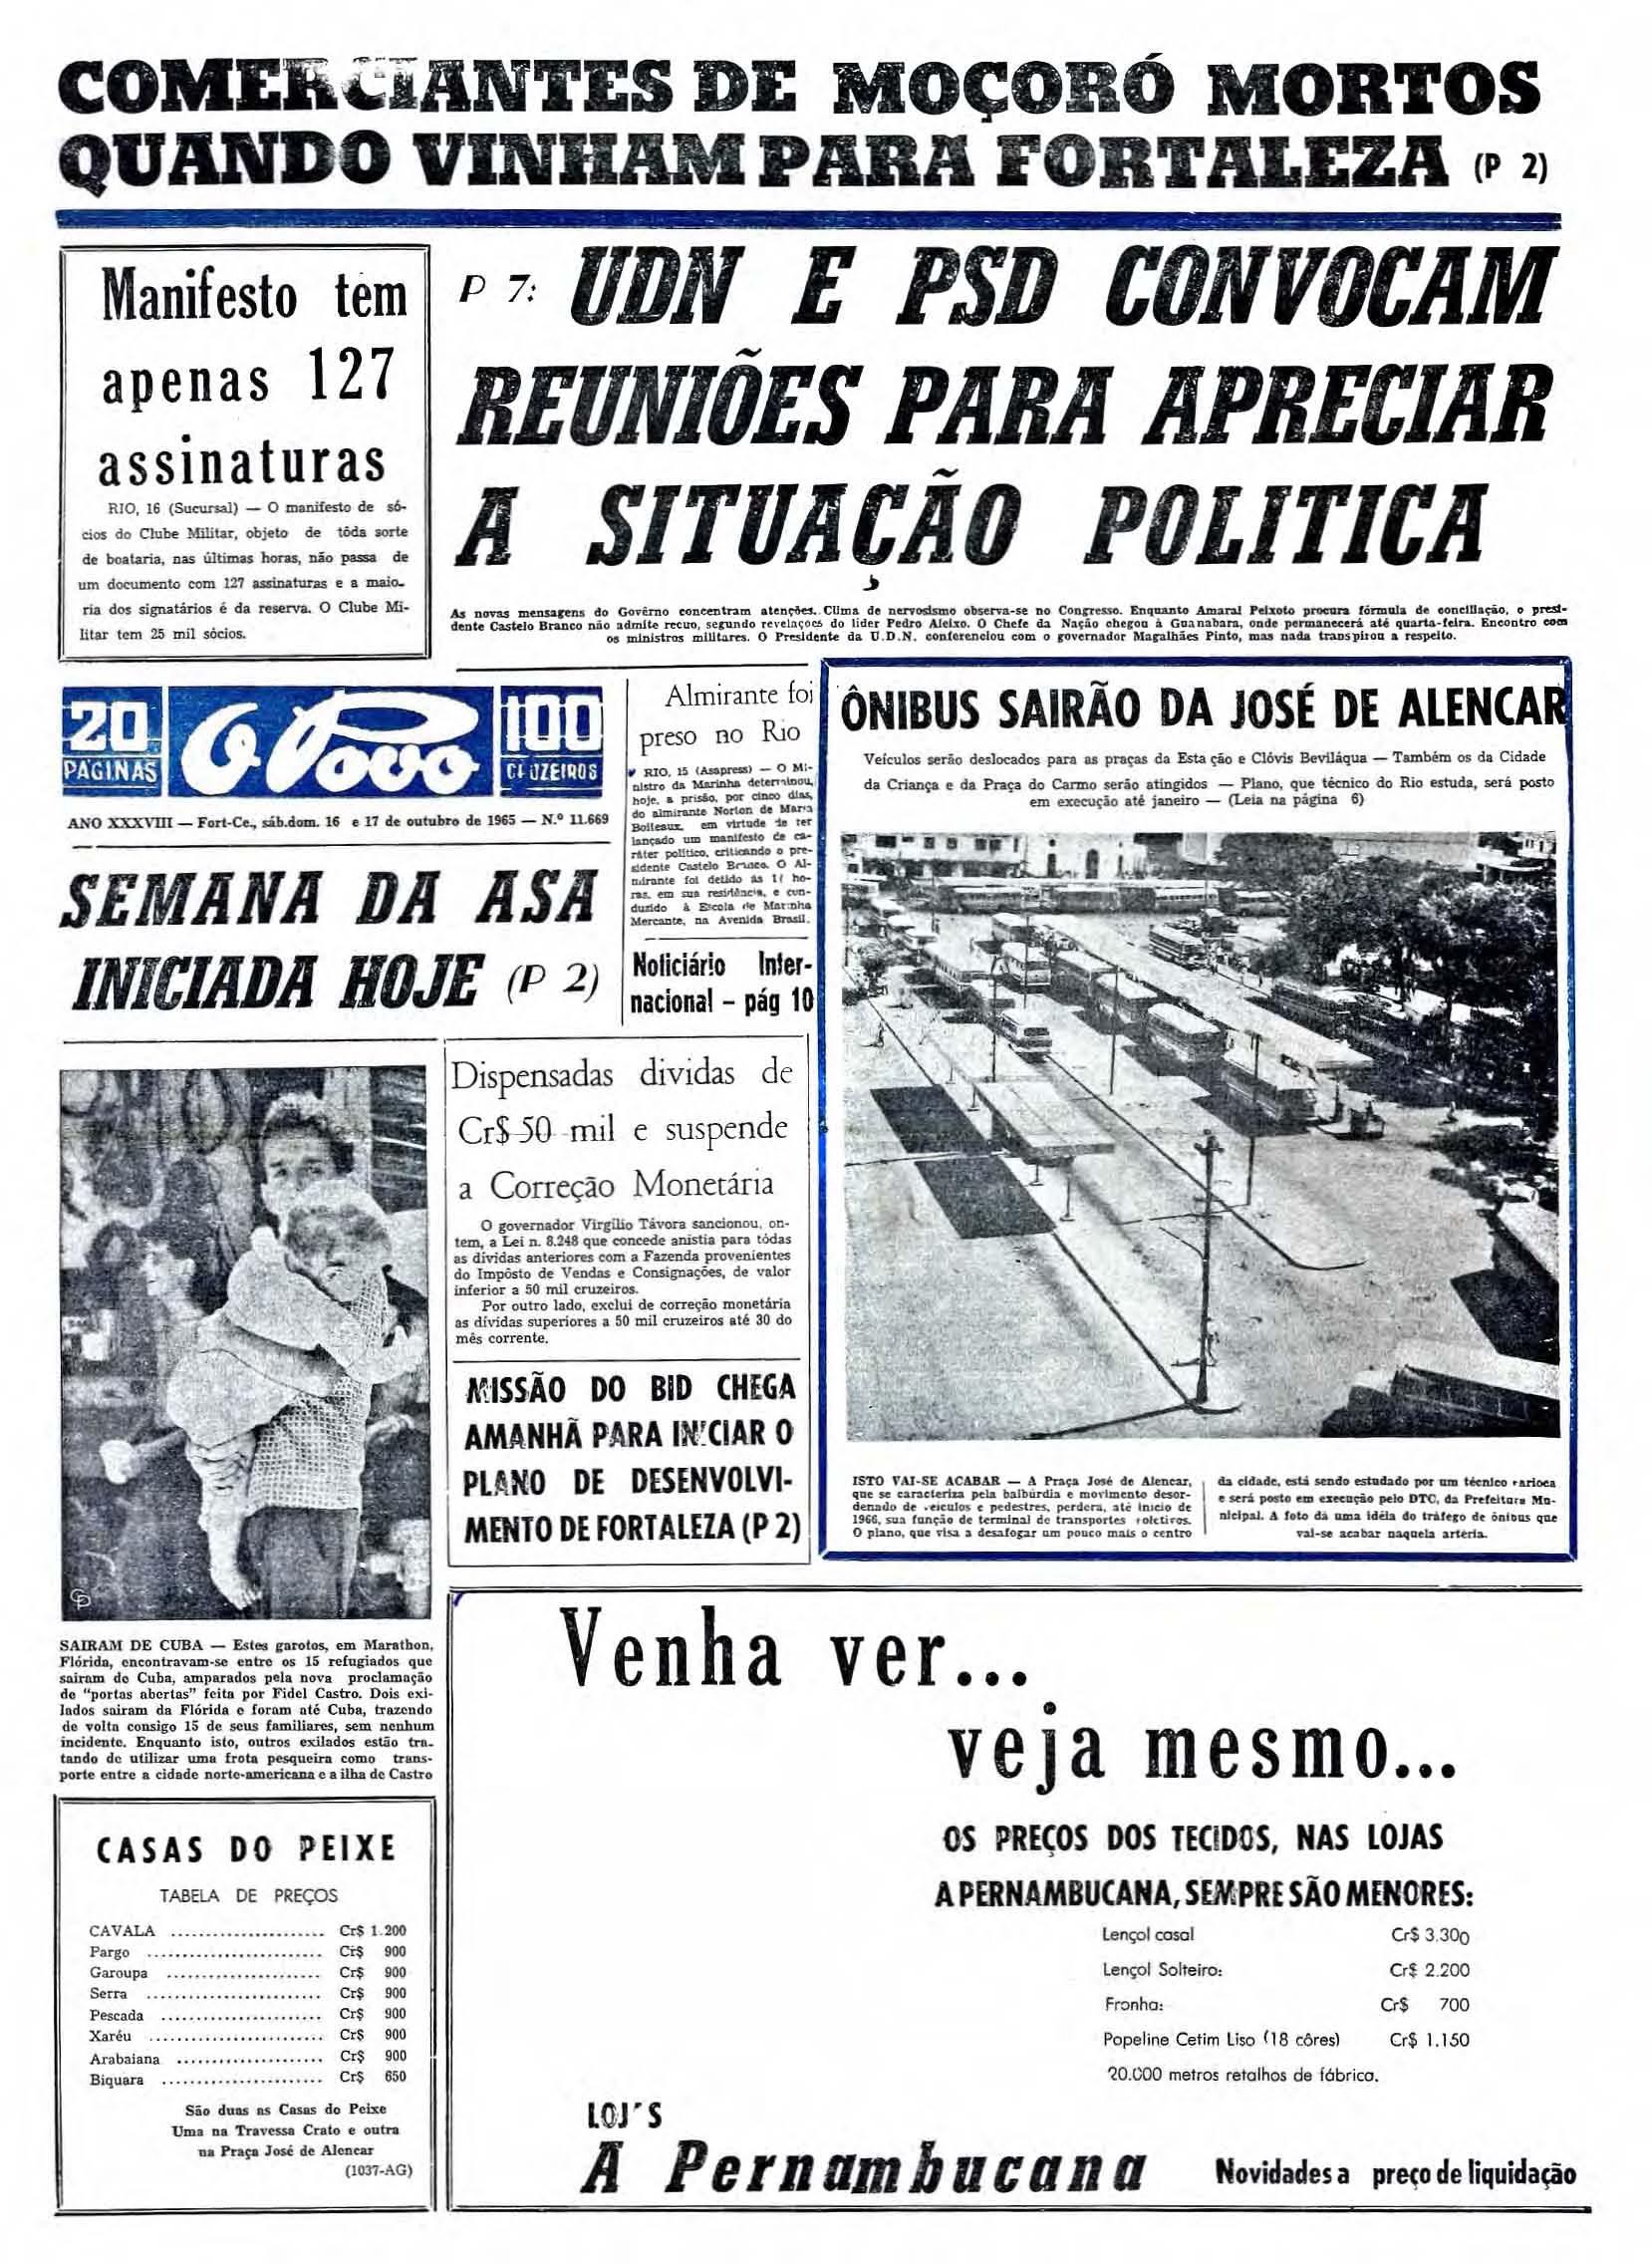 16-10-1965